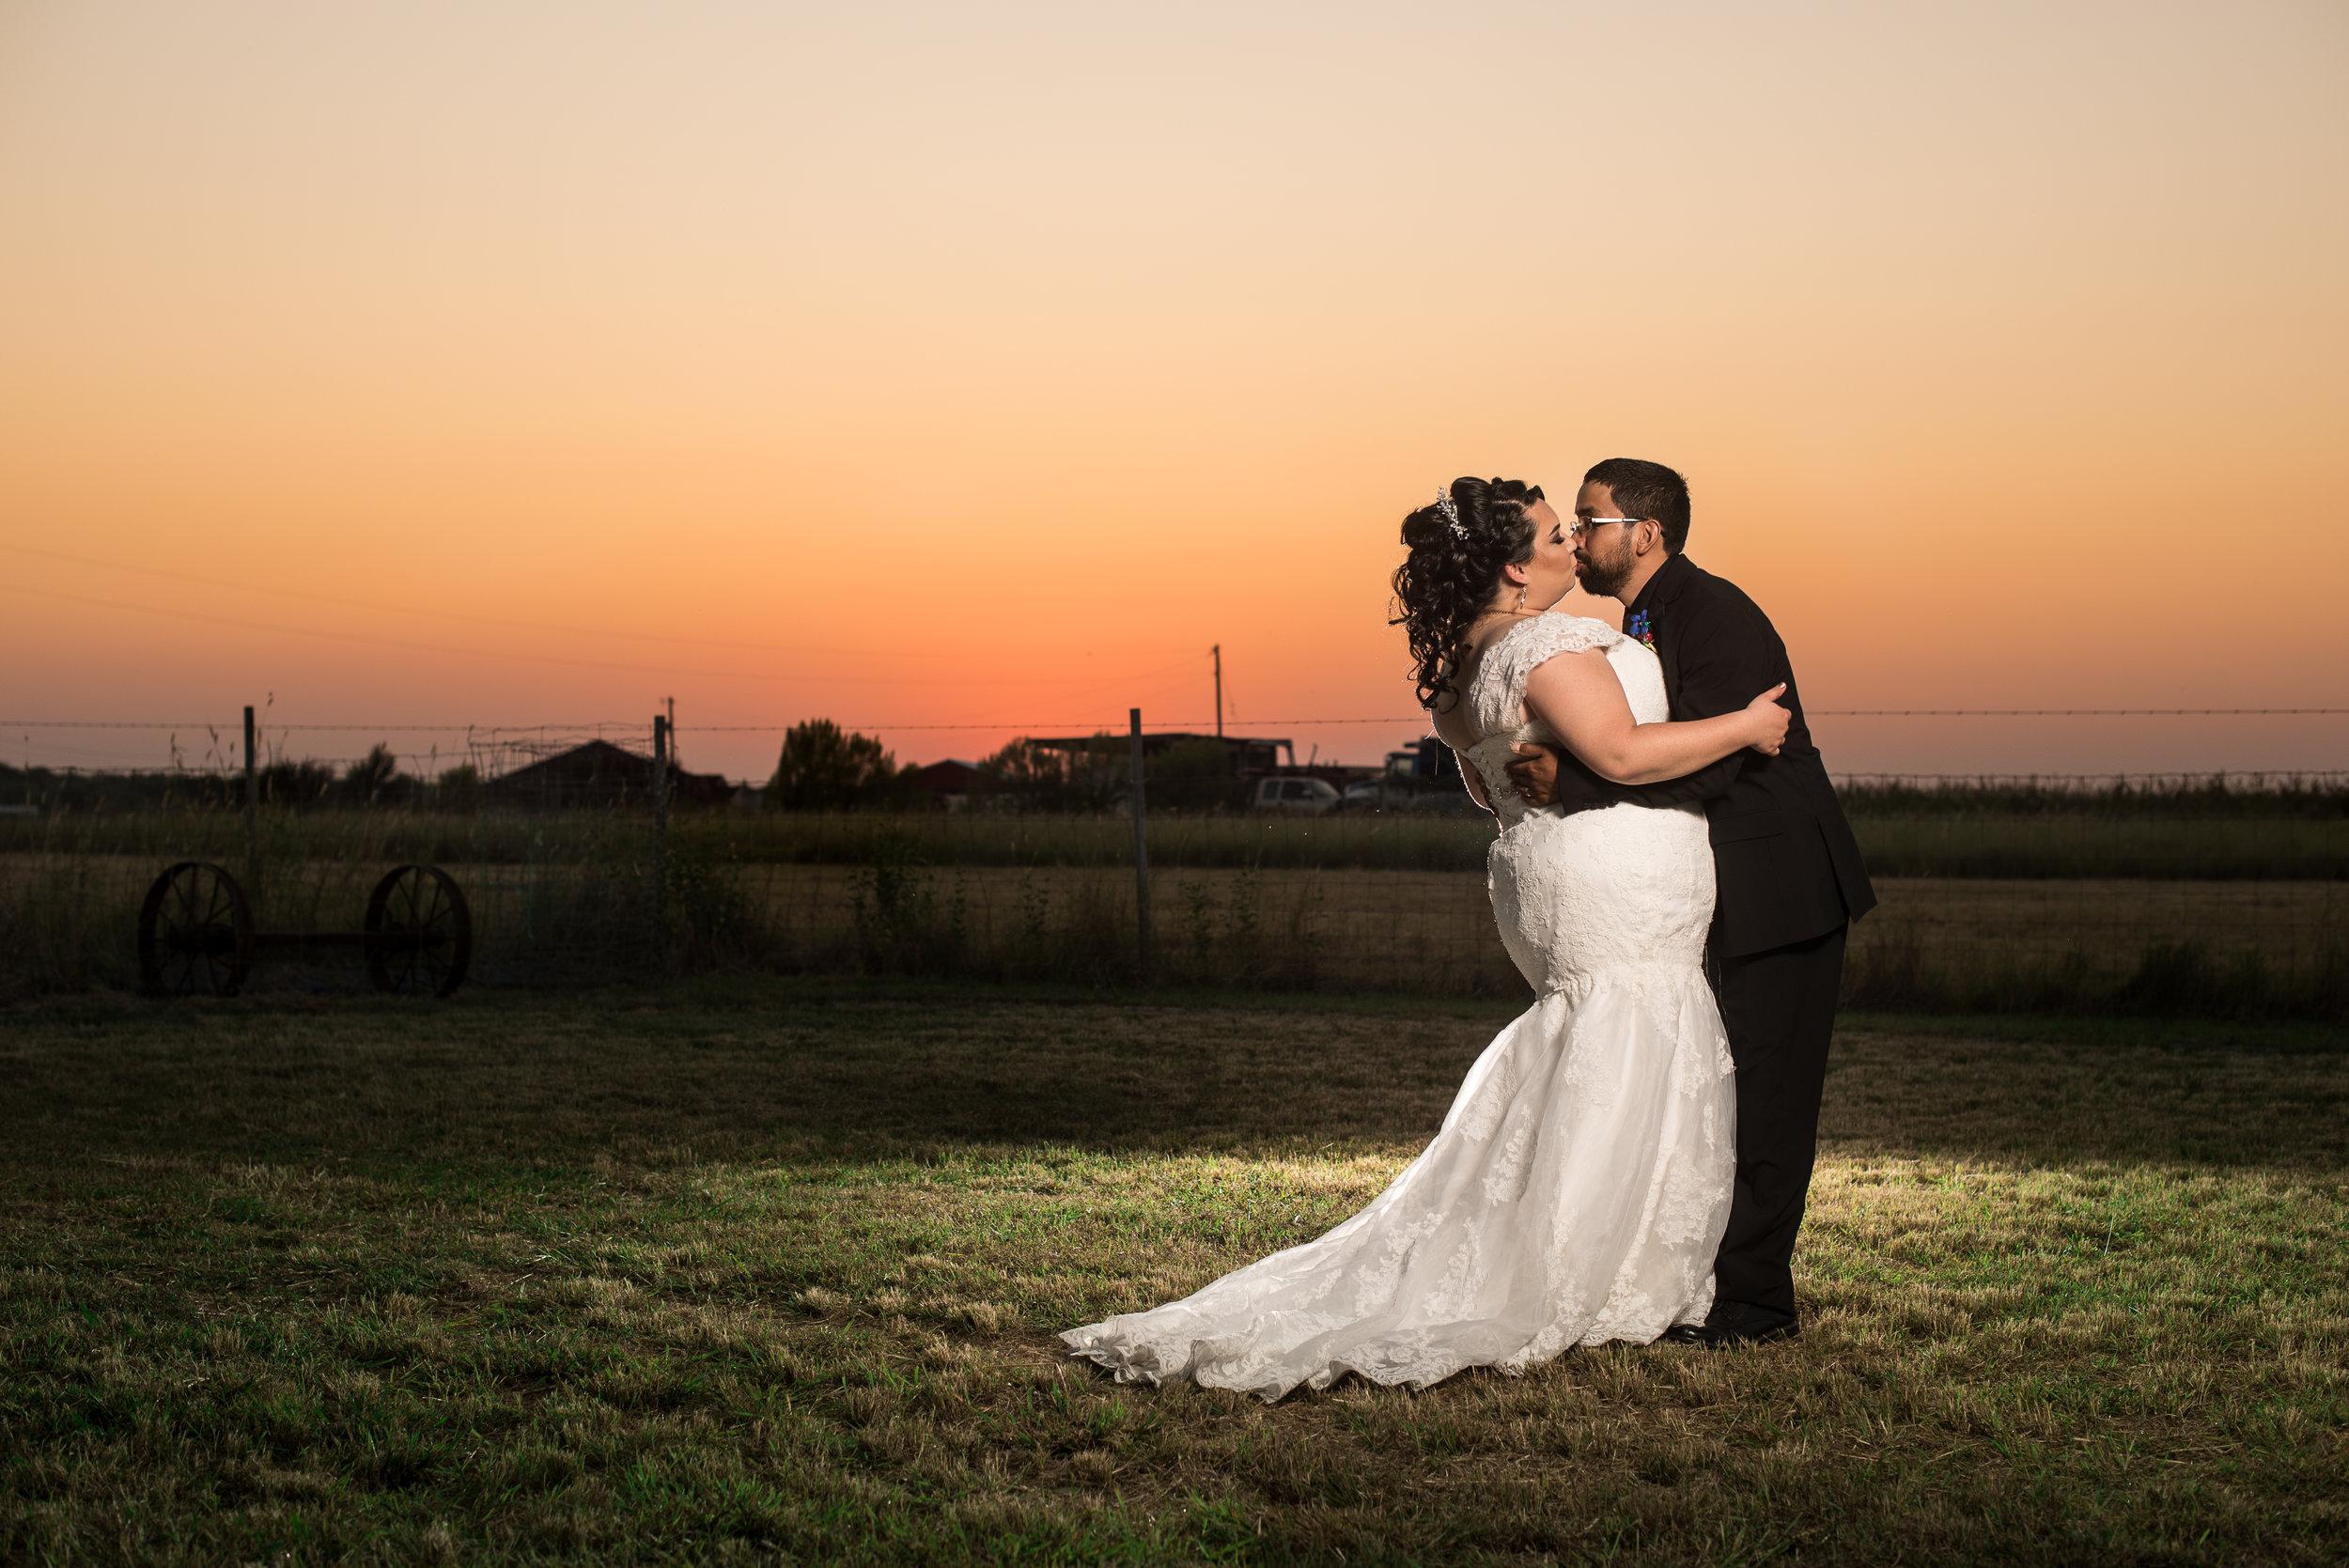 Leal Wedding Mira Visu Photography-1046.jpg